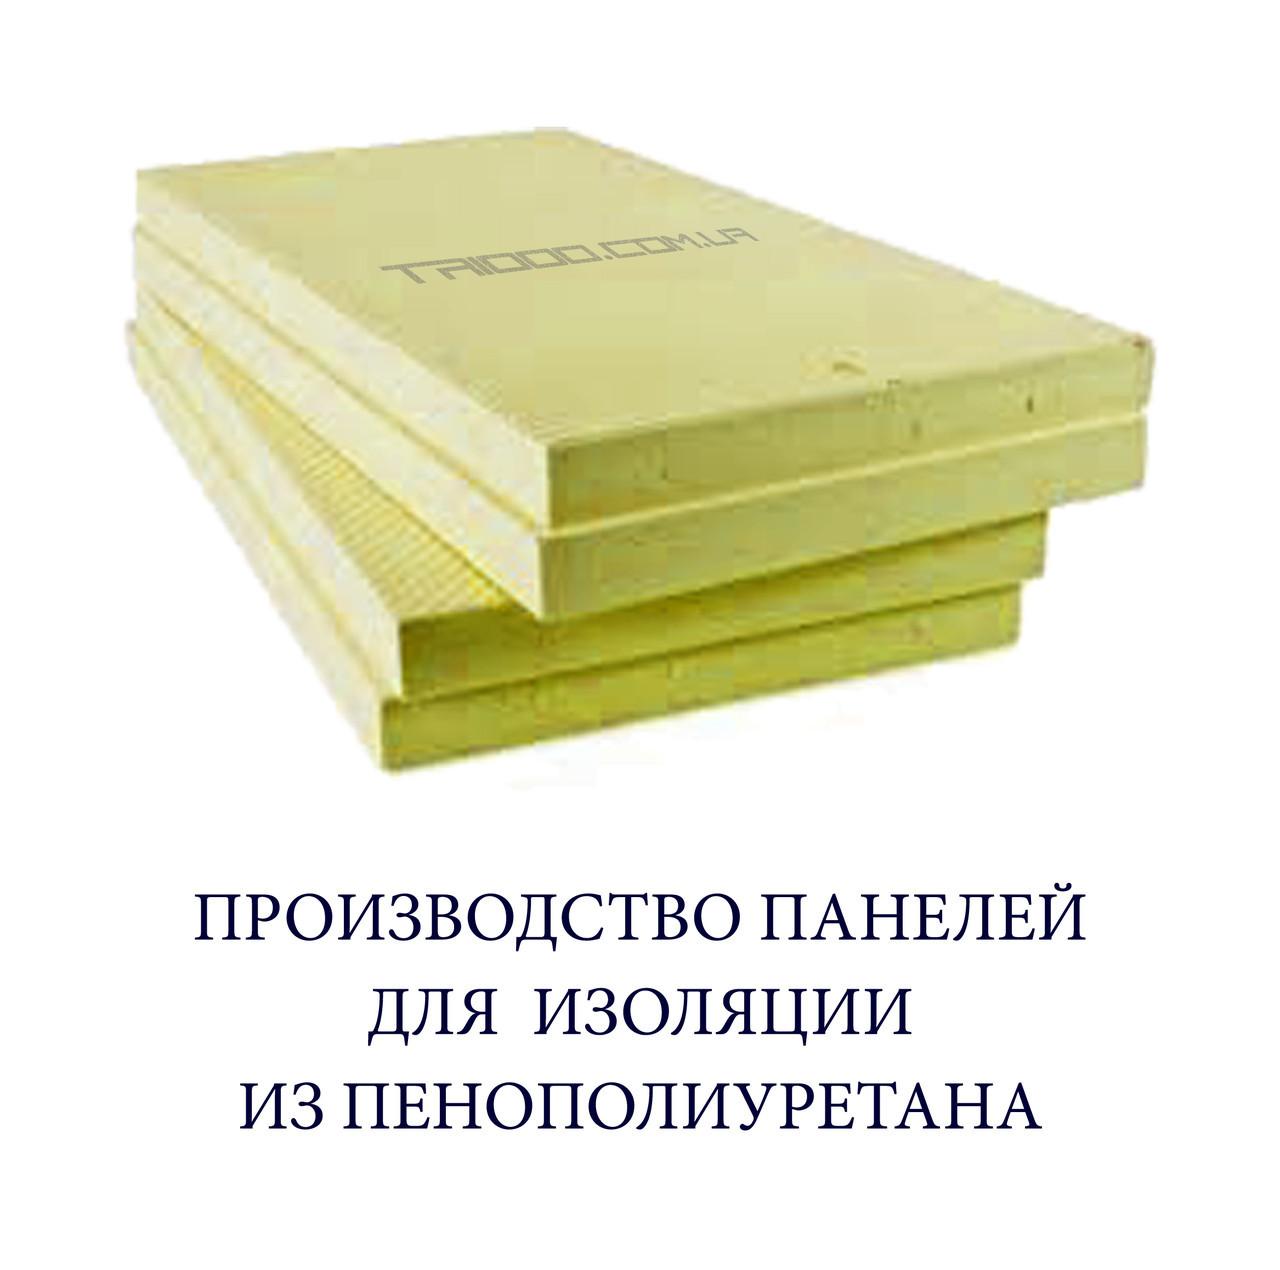 Плита пенополиуретановая (панель ППУ) 600 х 600 х 60 мм